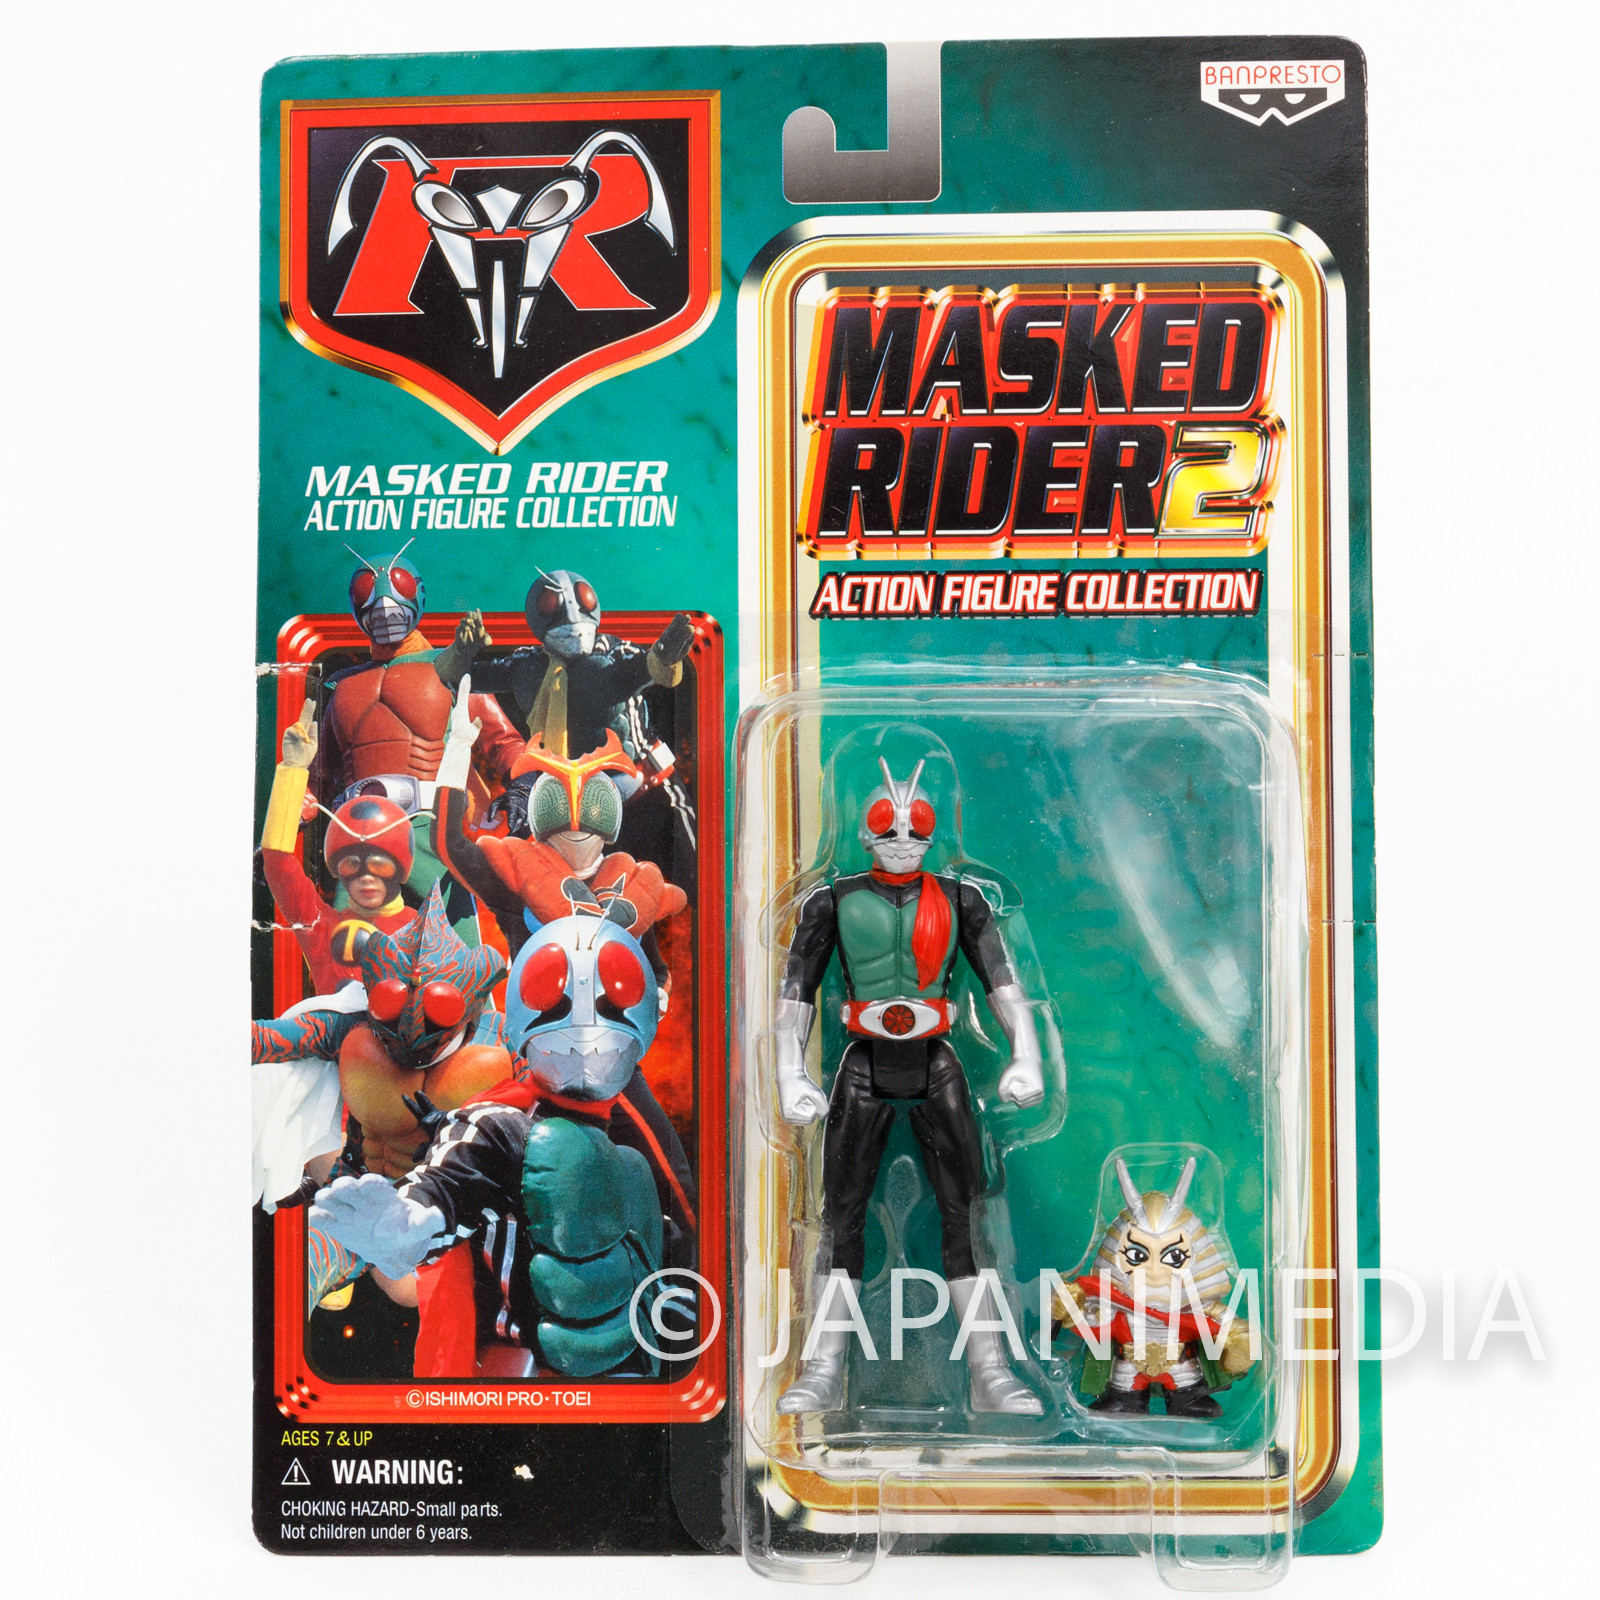 Kamen Rider New No.01 Masked Rider 2 Action Figure Collection JAPAN  TOKUSATSU